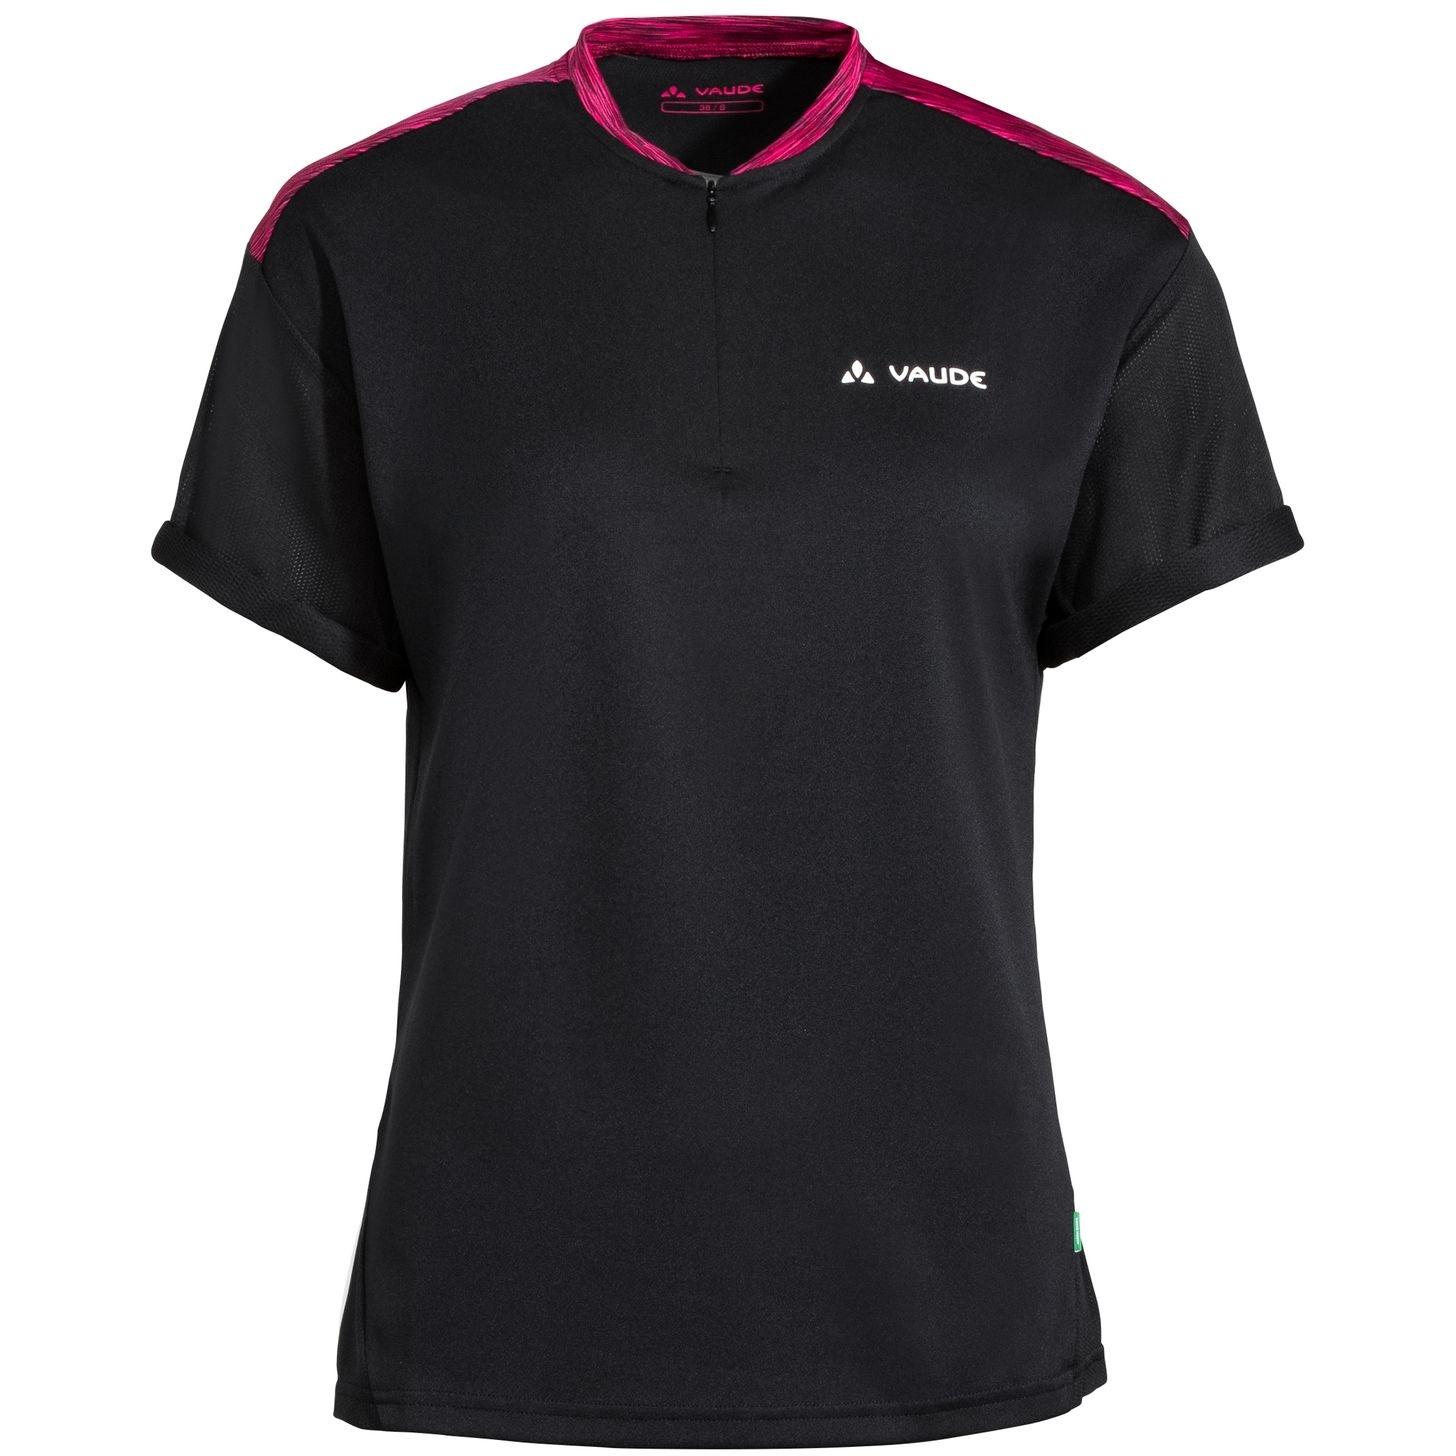 Vaude Qimsa Damen T-Shirt - black